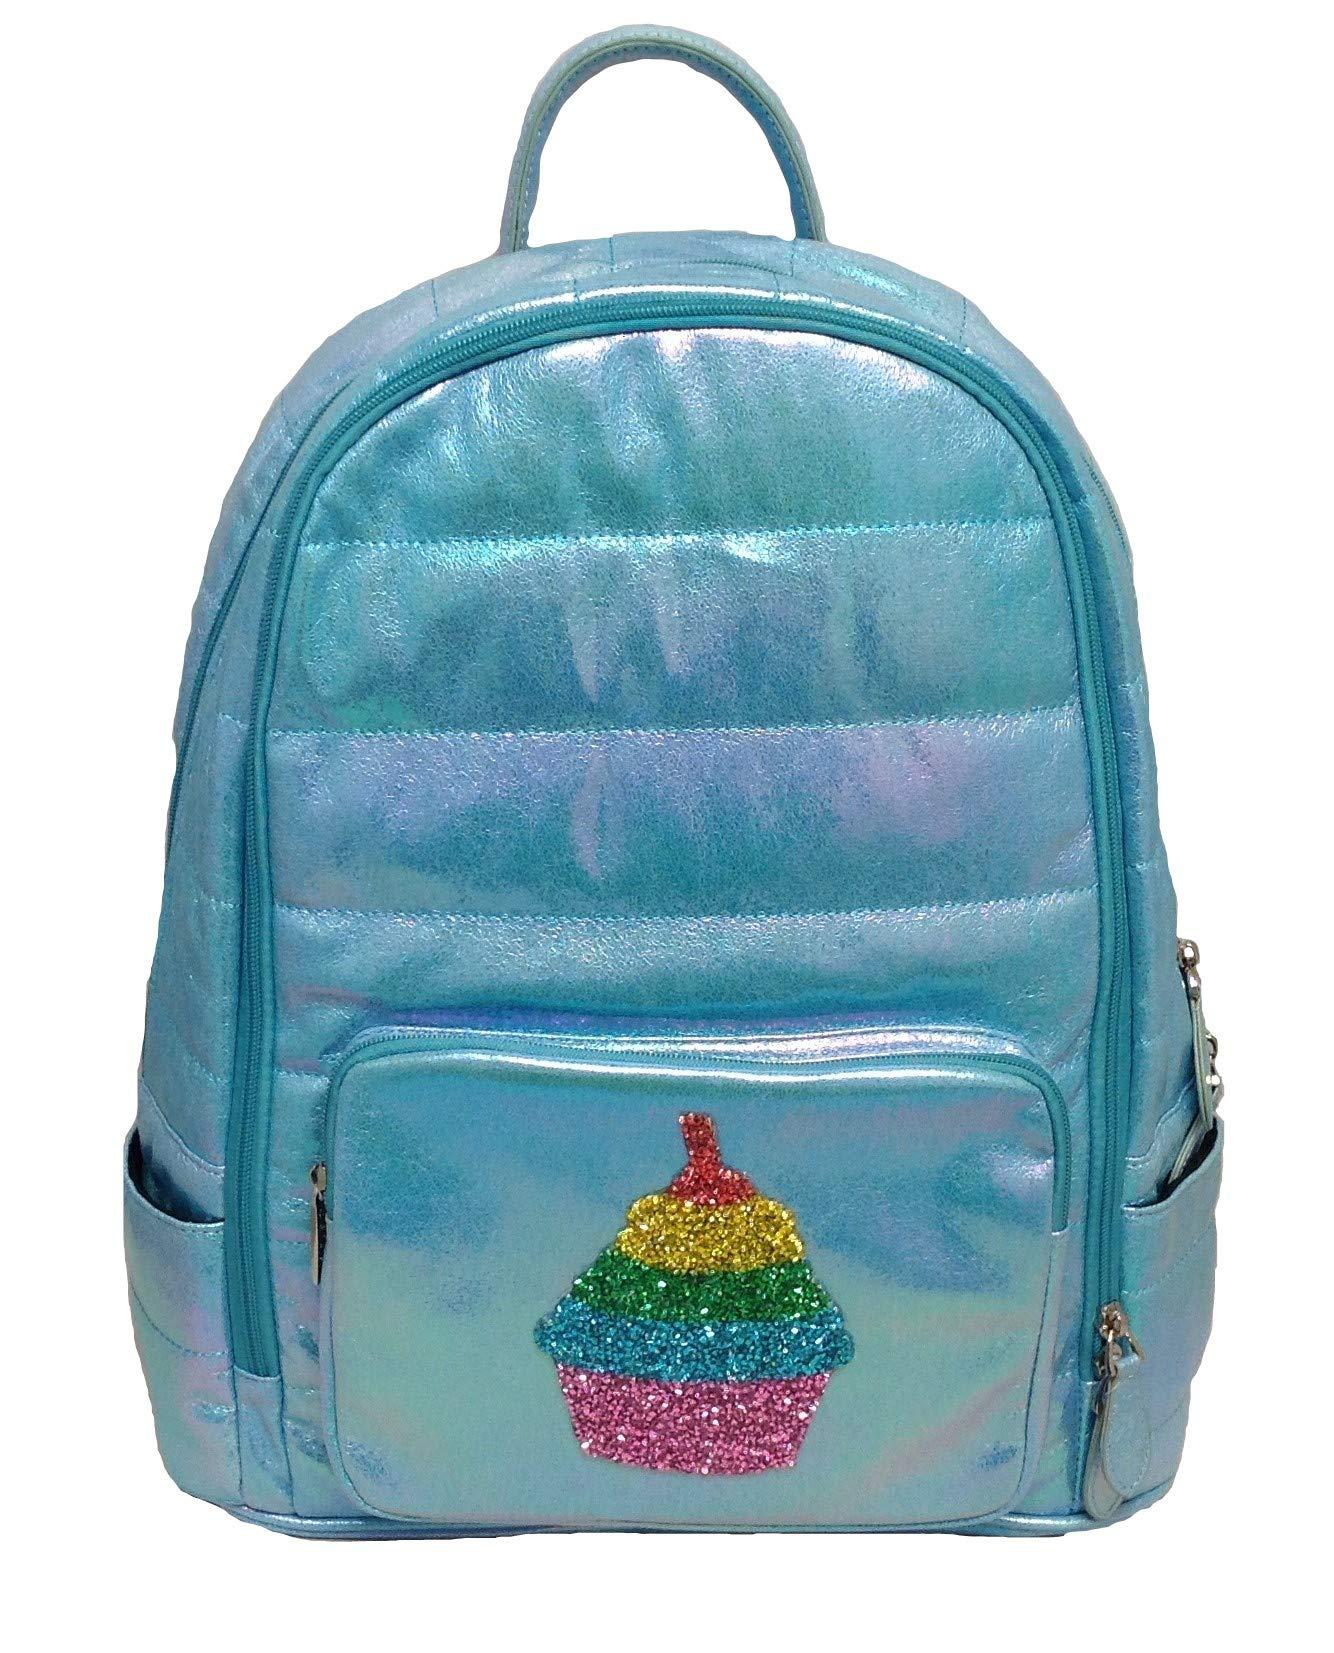 Bari Lynn Girls Backpack (Blue Cupcake) by Bari Lynn